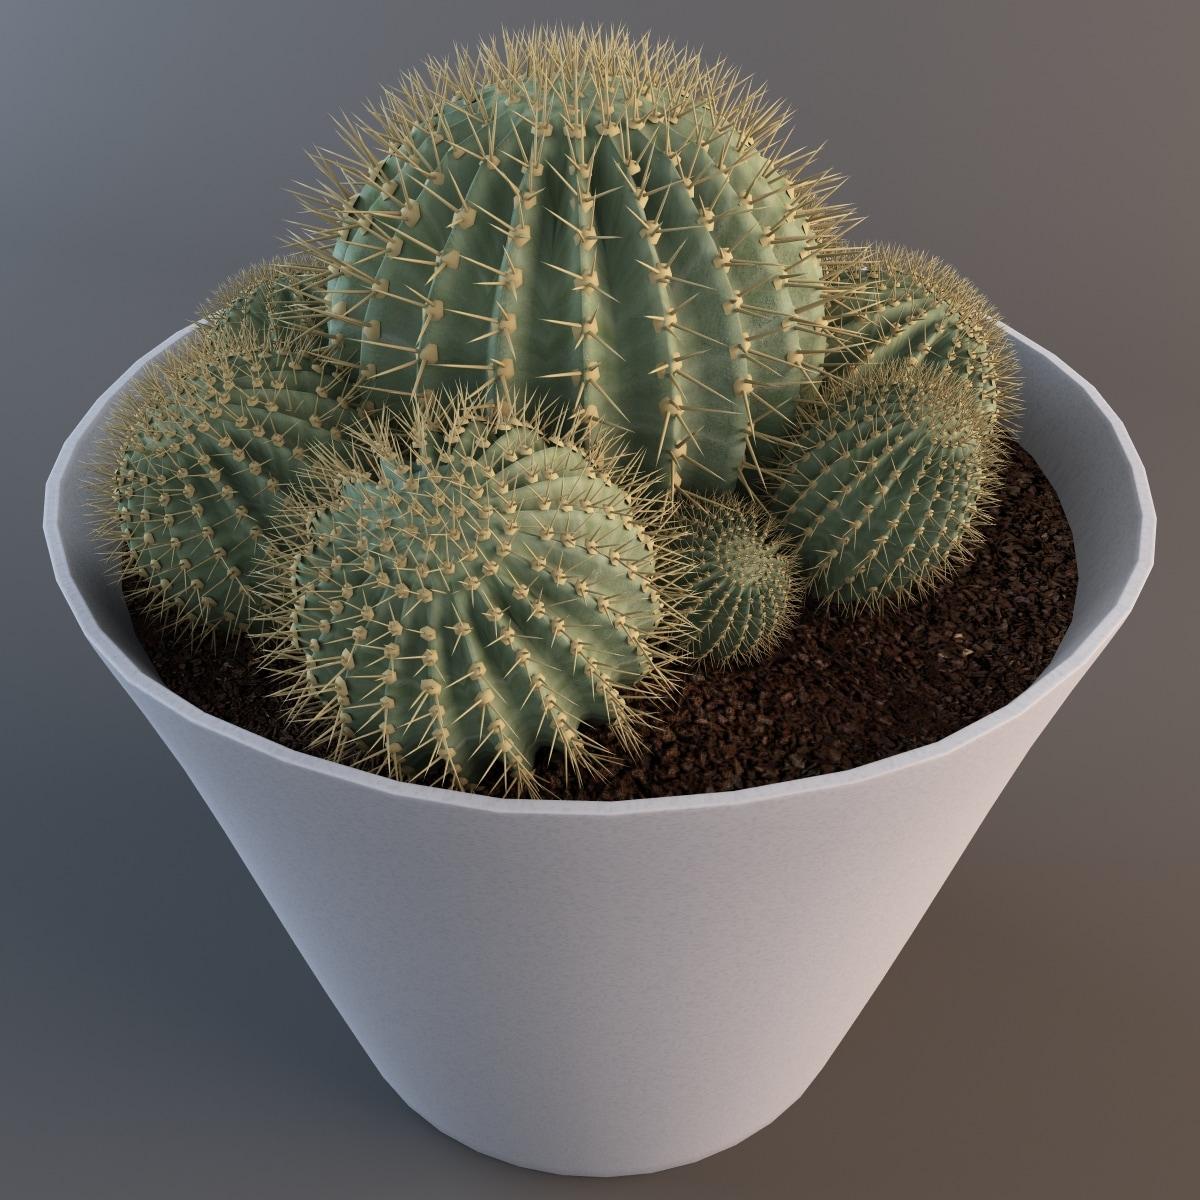 101985_Cactus_Epiphyllum_Sp_v2_005.jpg